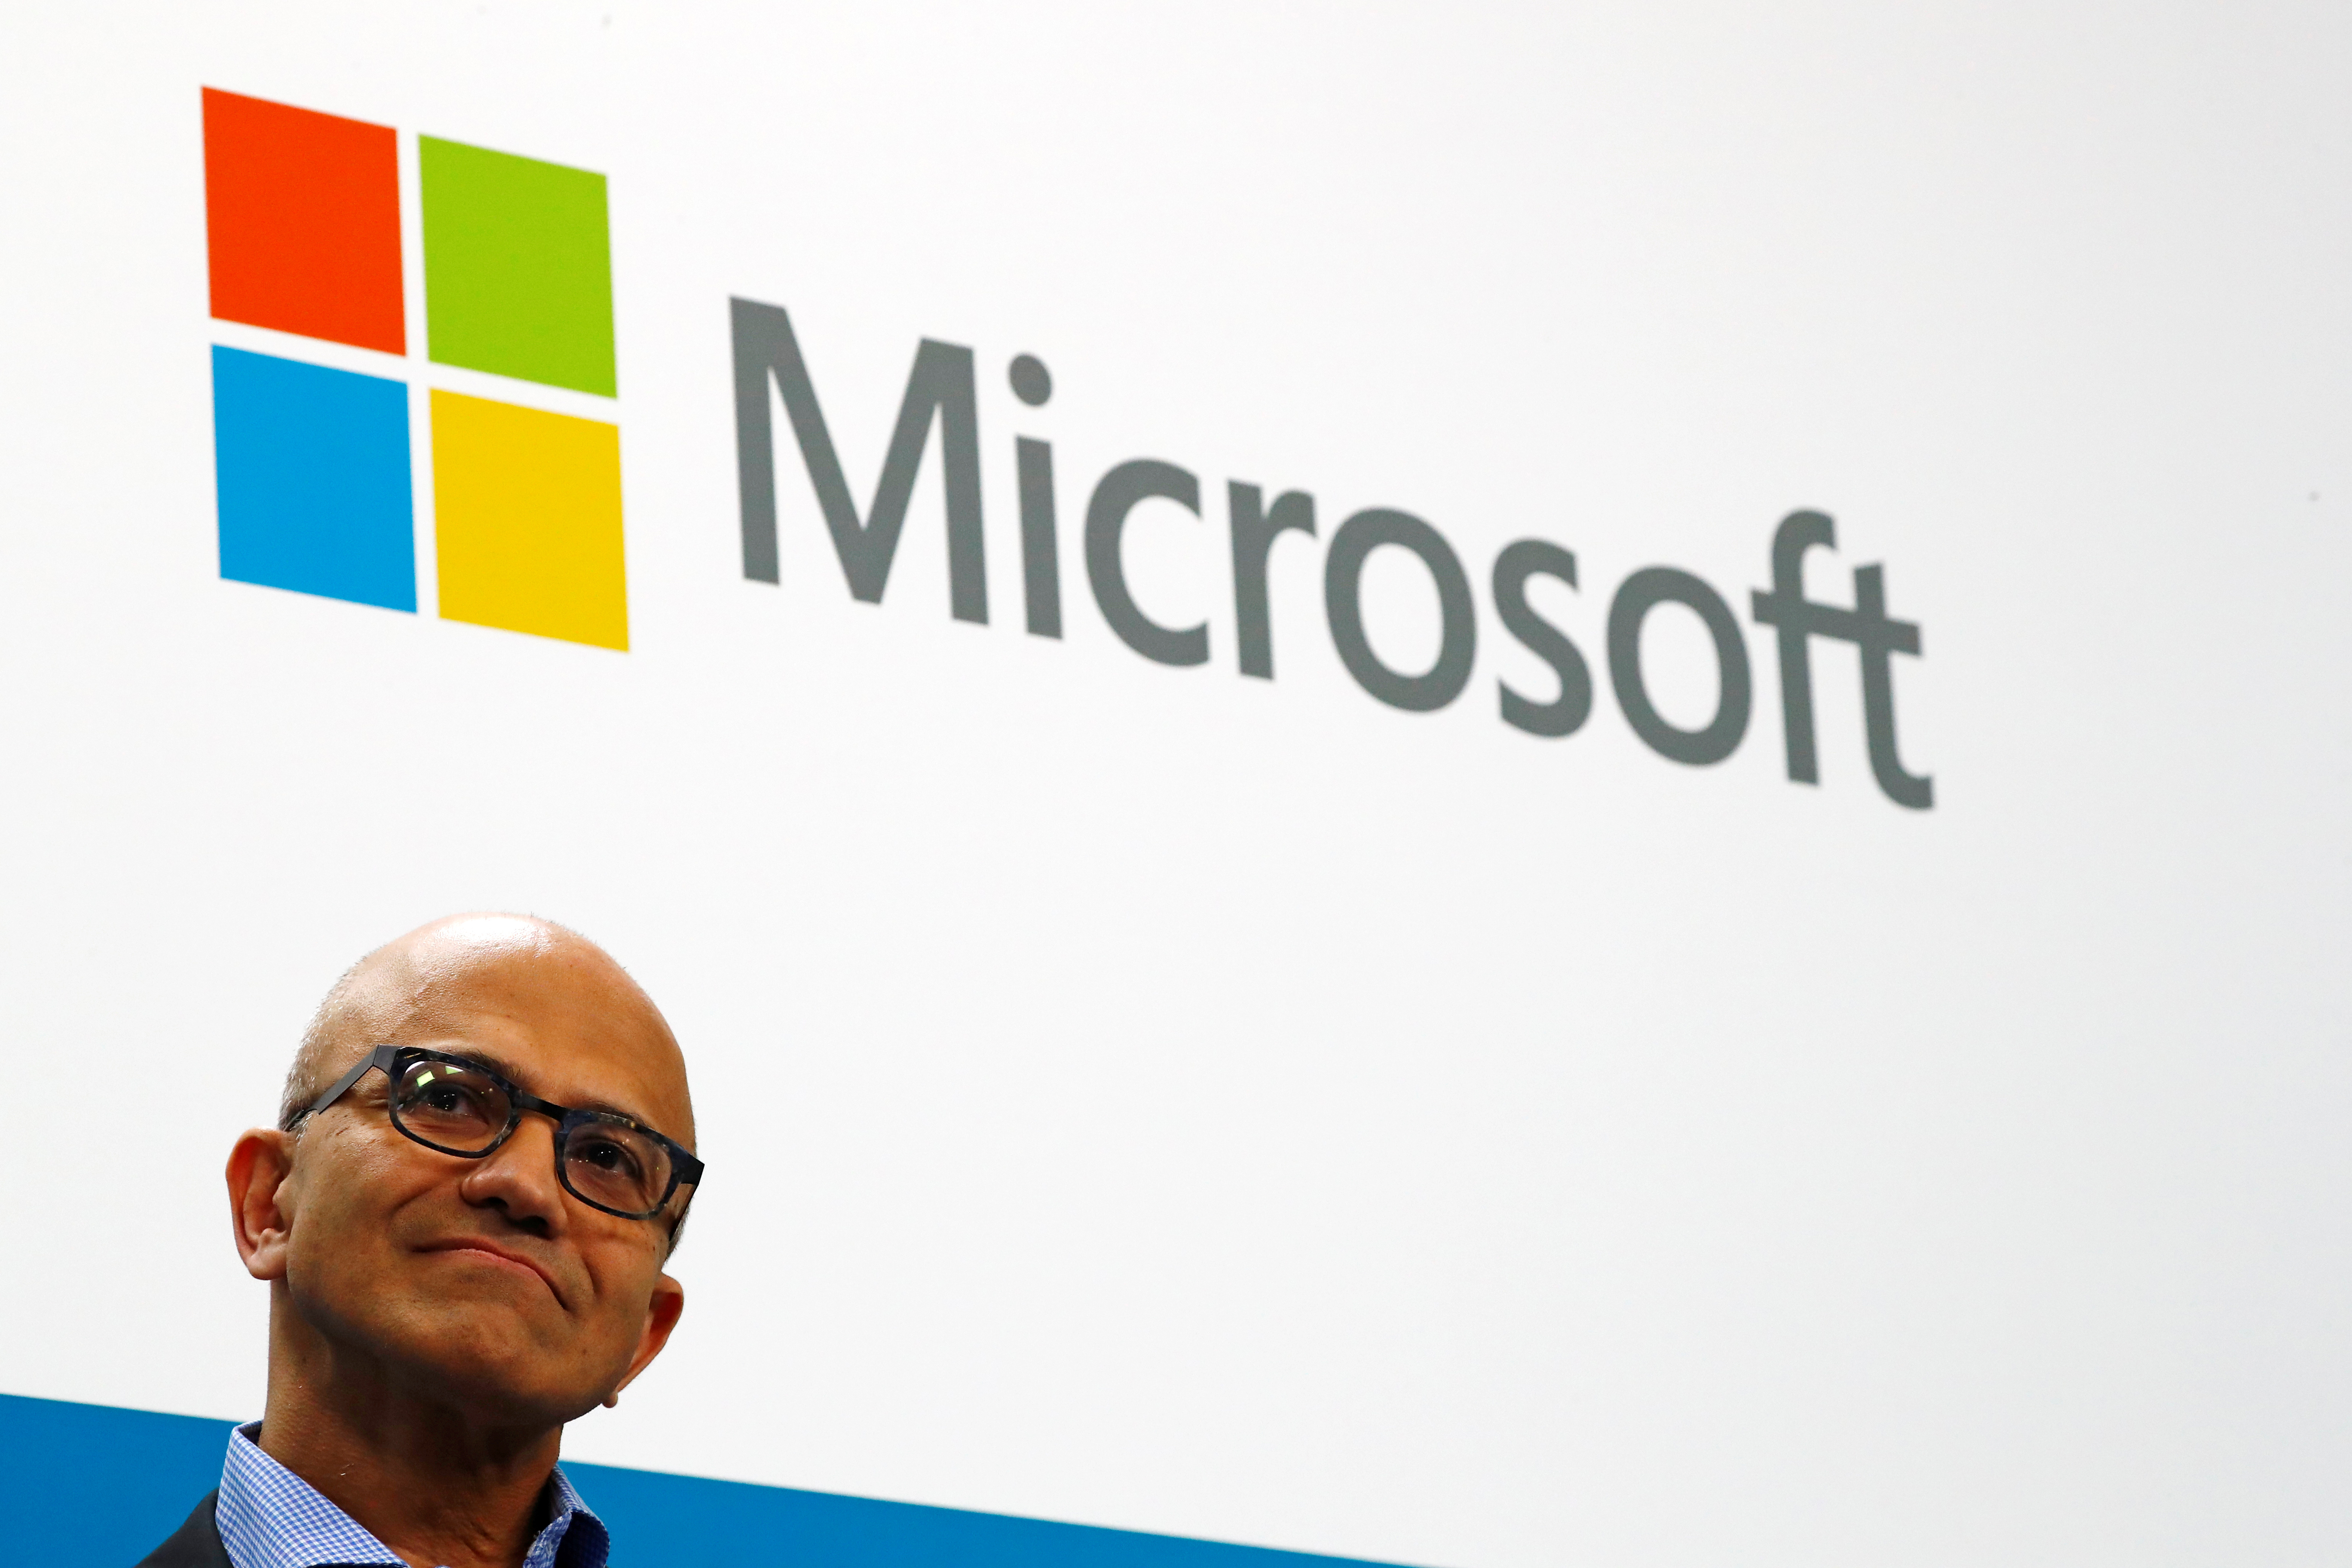 Microsoft CEO Satya Nadella addresses a news conference in Berlin, Germany February 27, 2019. REUTERS/Fabrizio Bensch